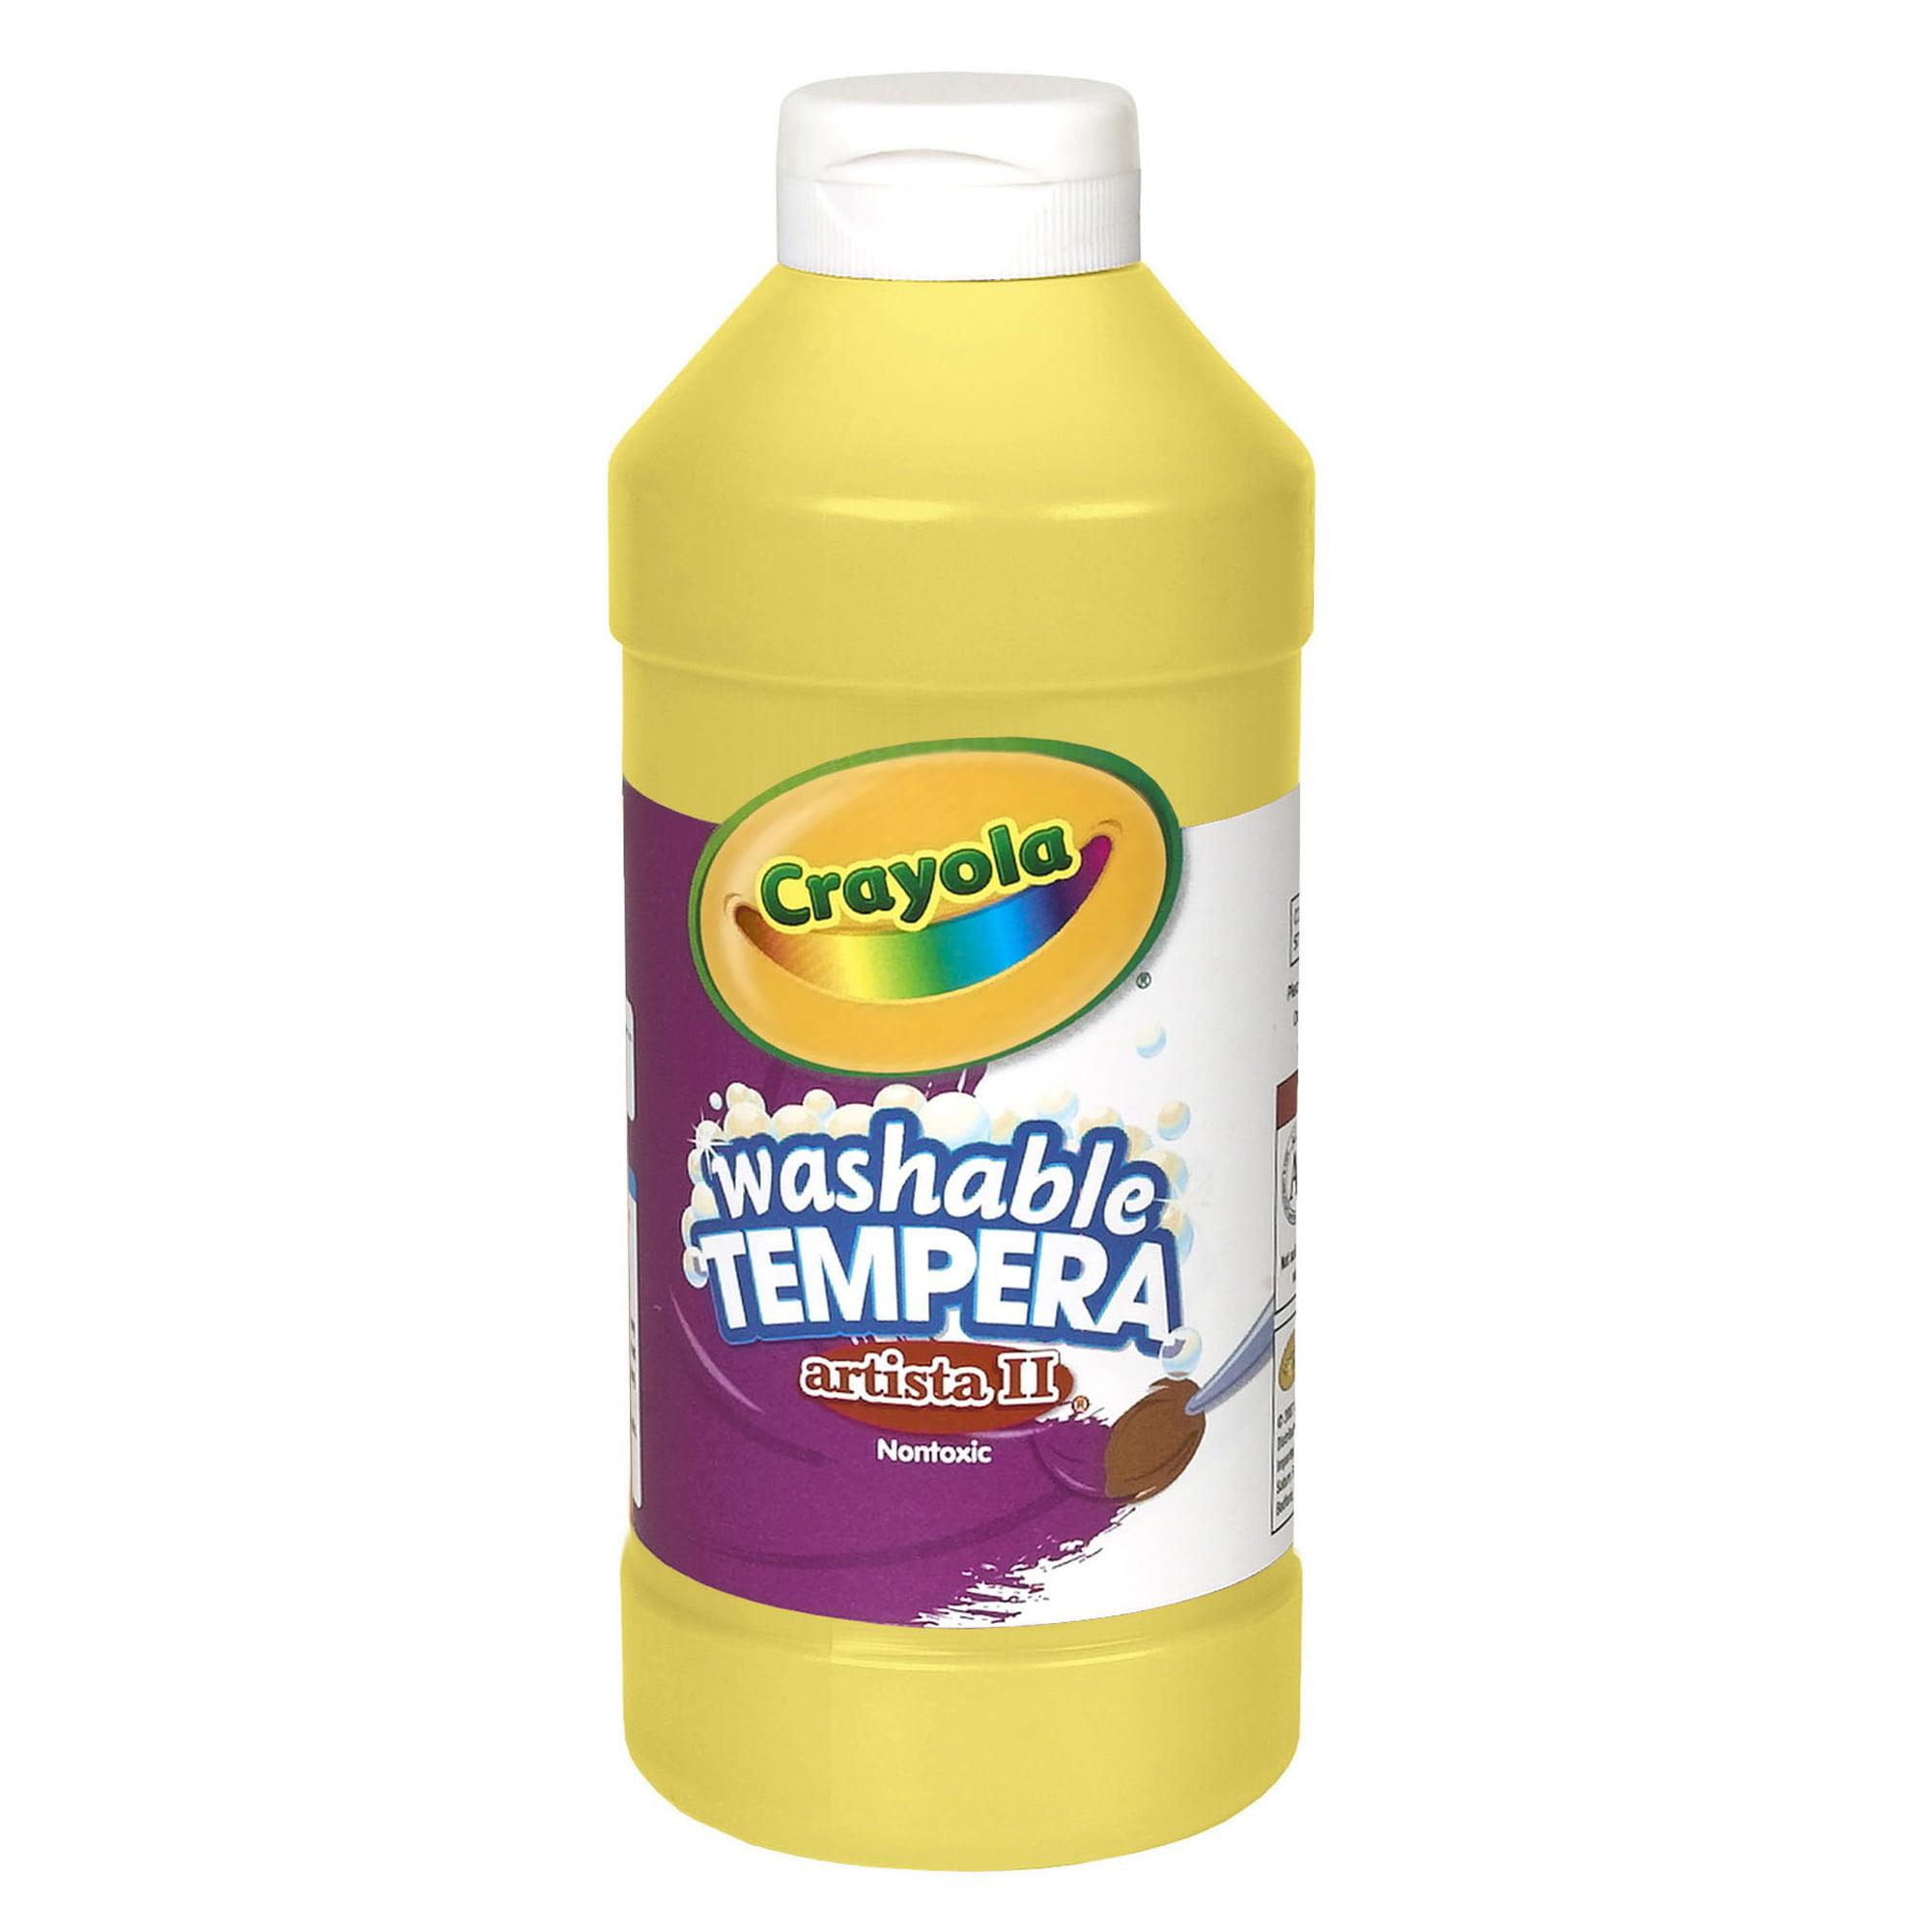 Crayola Artista Ii Washable Liquid Tempera Paint, Yellow, 16 Oz Bottle, Set Of 6 Bottles